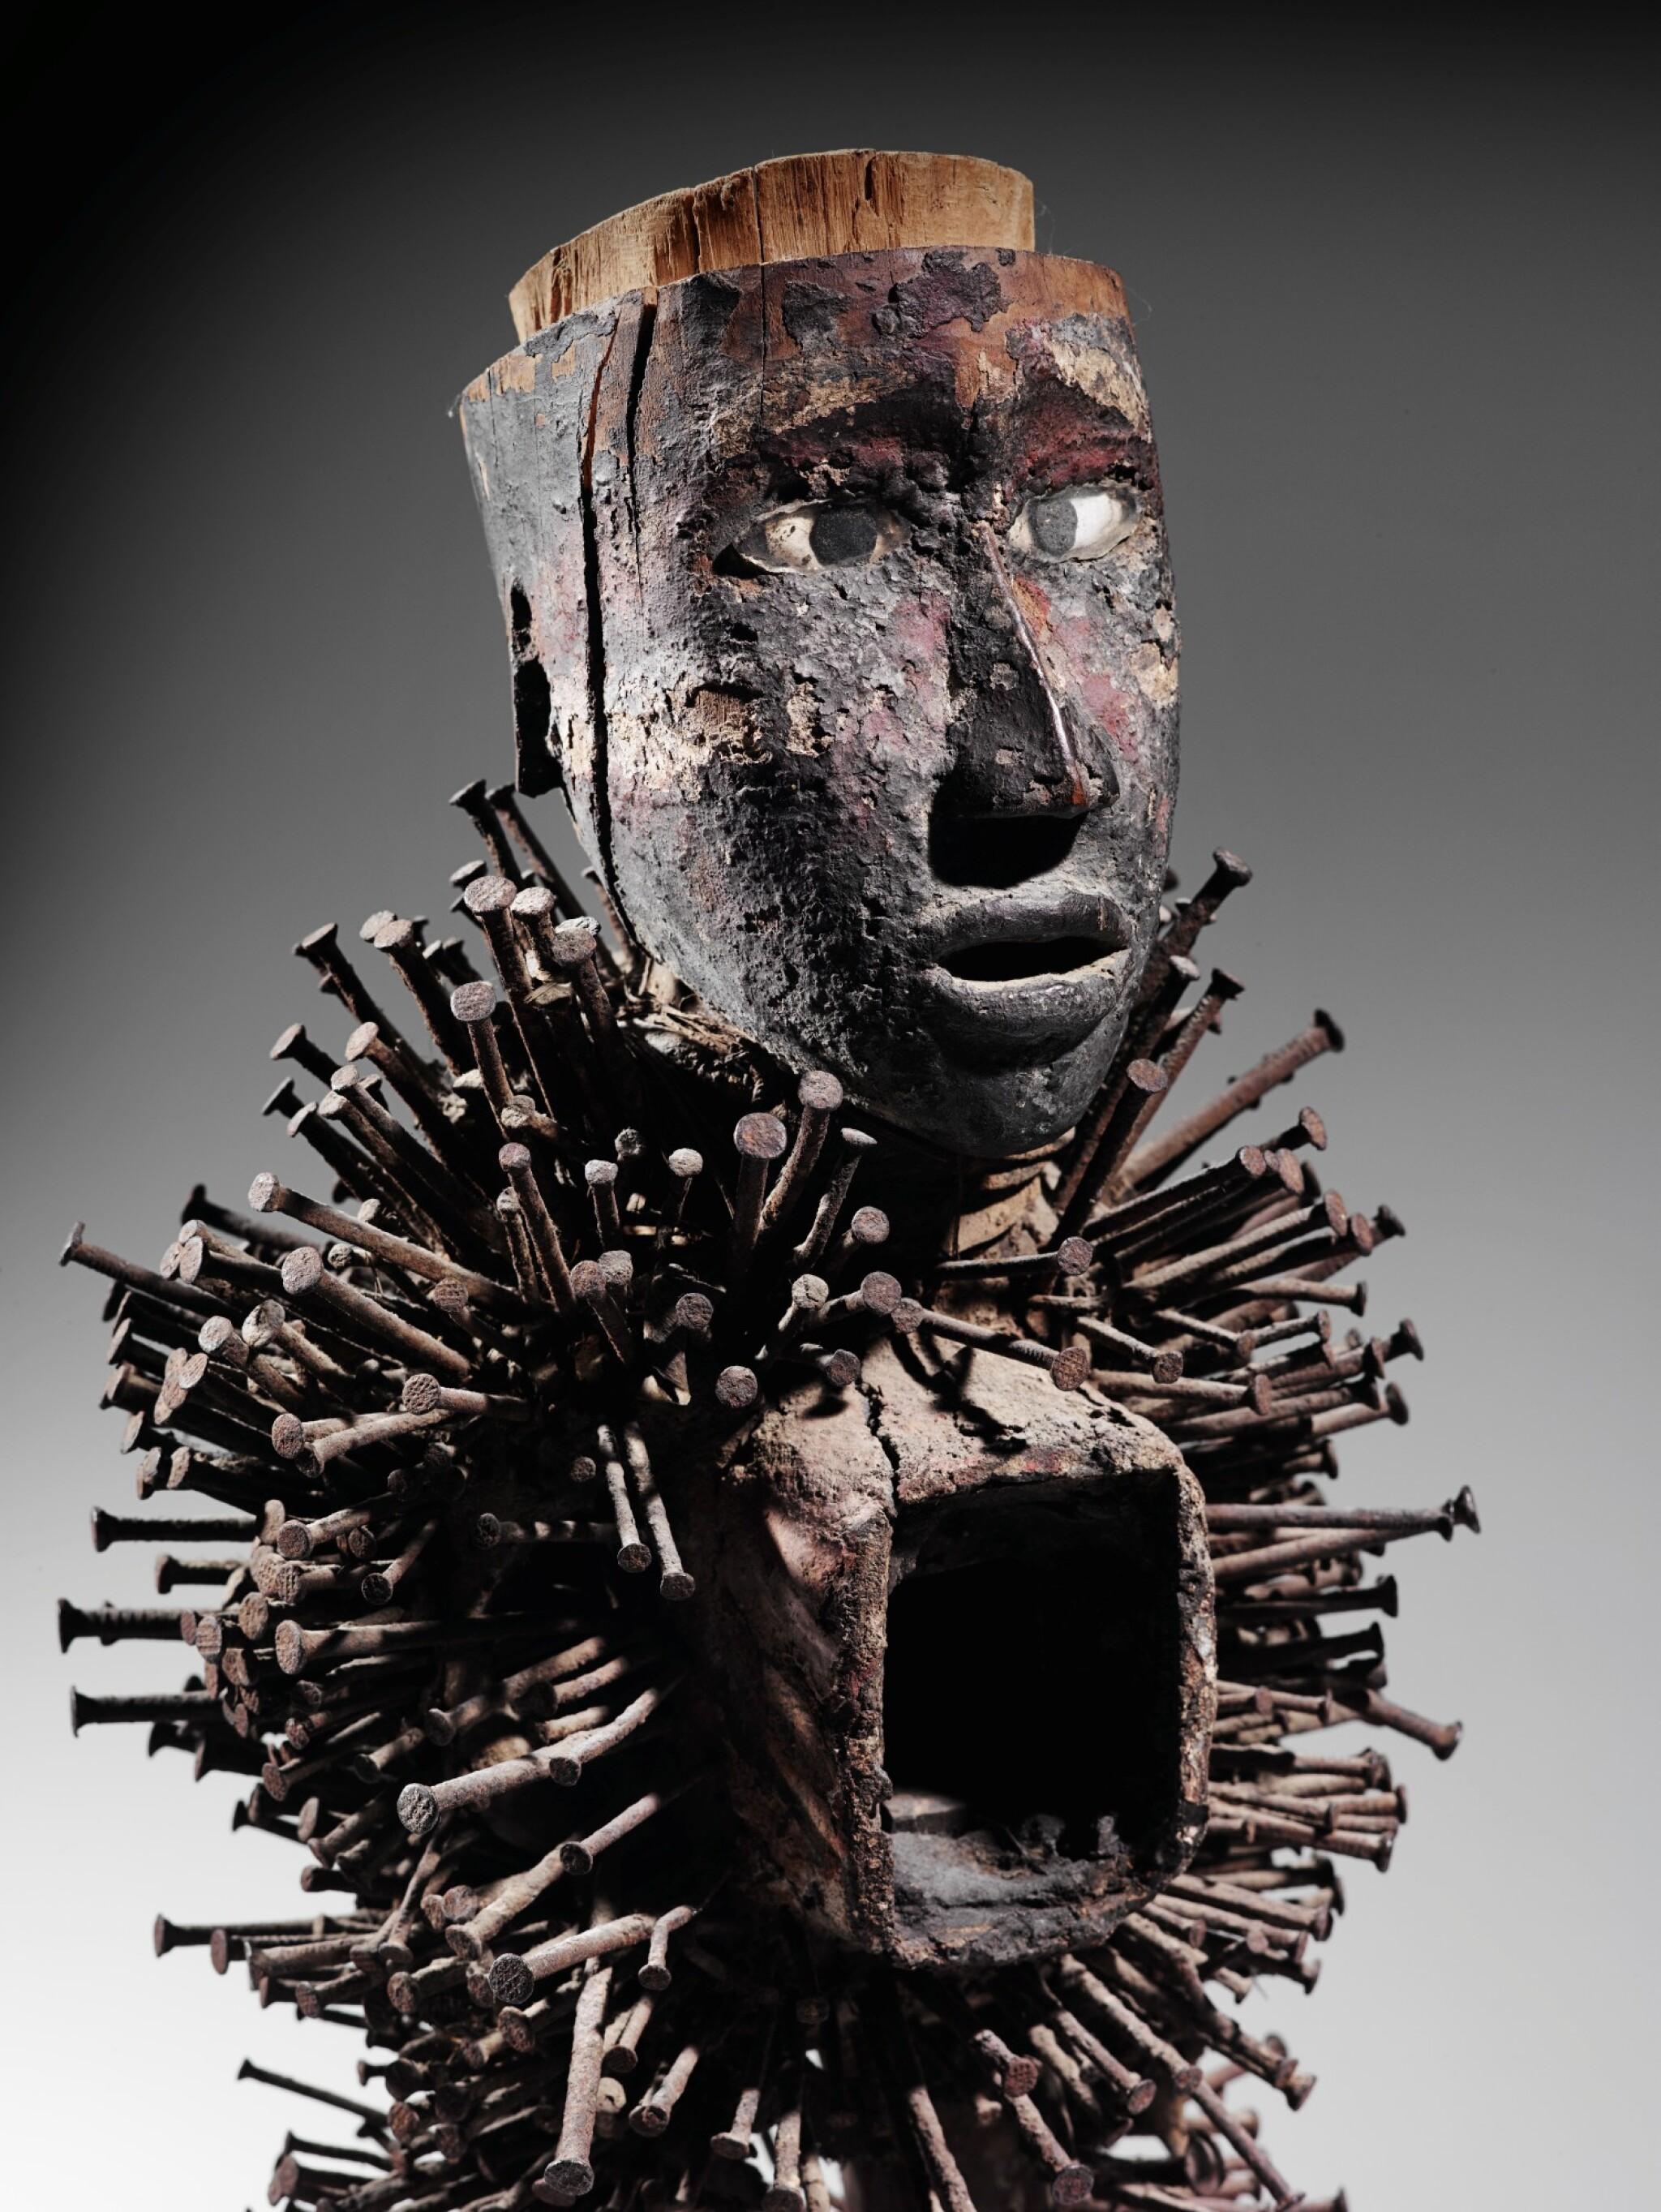 View full screen - View 1 of Lot 46. Statue nkonde, Kongo Vili, République Démocratique du Congo | Kongo Vili nkonde figure, Democratic Republic of the Congo.